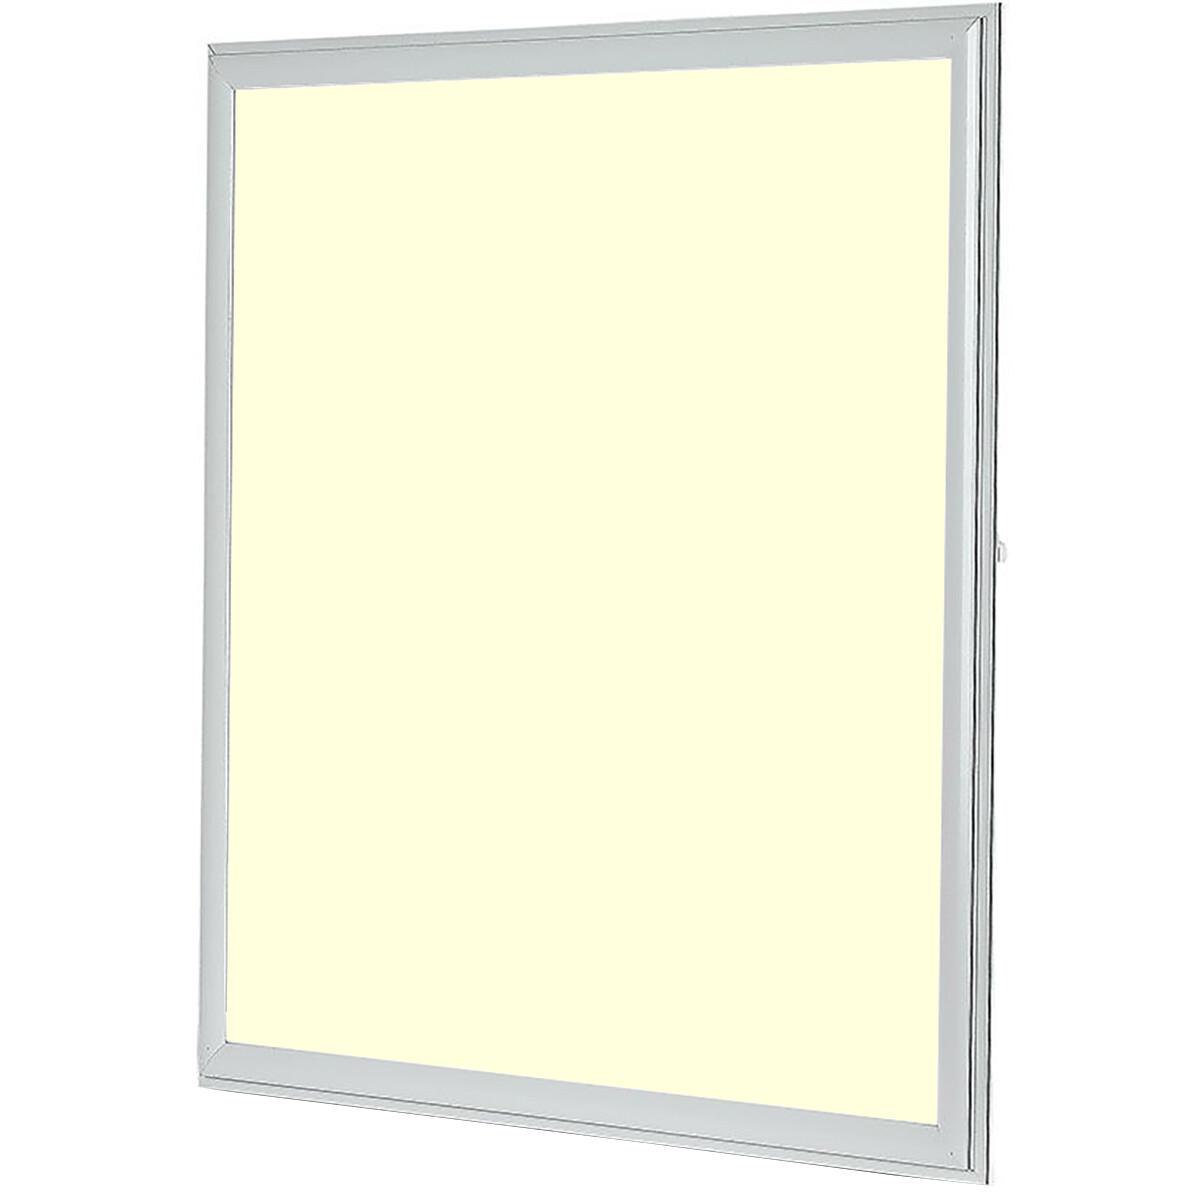 LED Paneel - Viron Ganto - 60x60 Warm Wit 3000K - 29W Inbouw Vierkant - Mat Wit - Aluminium